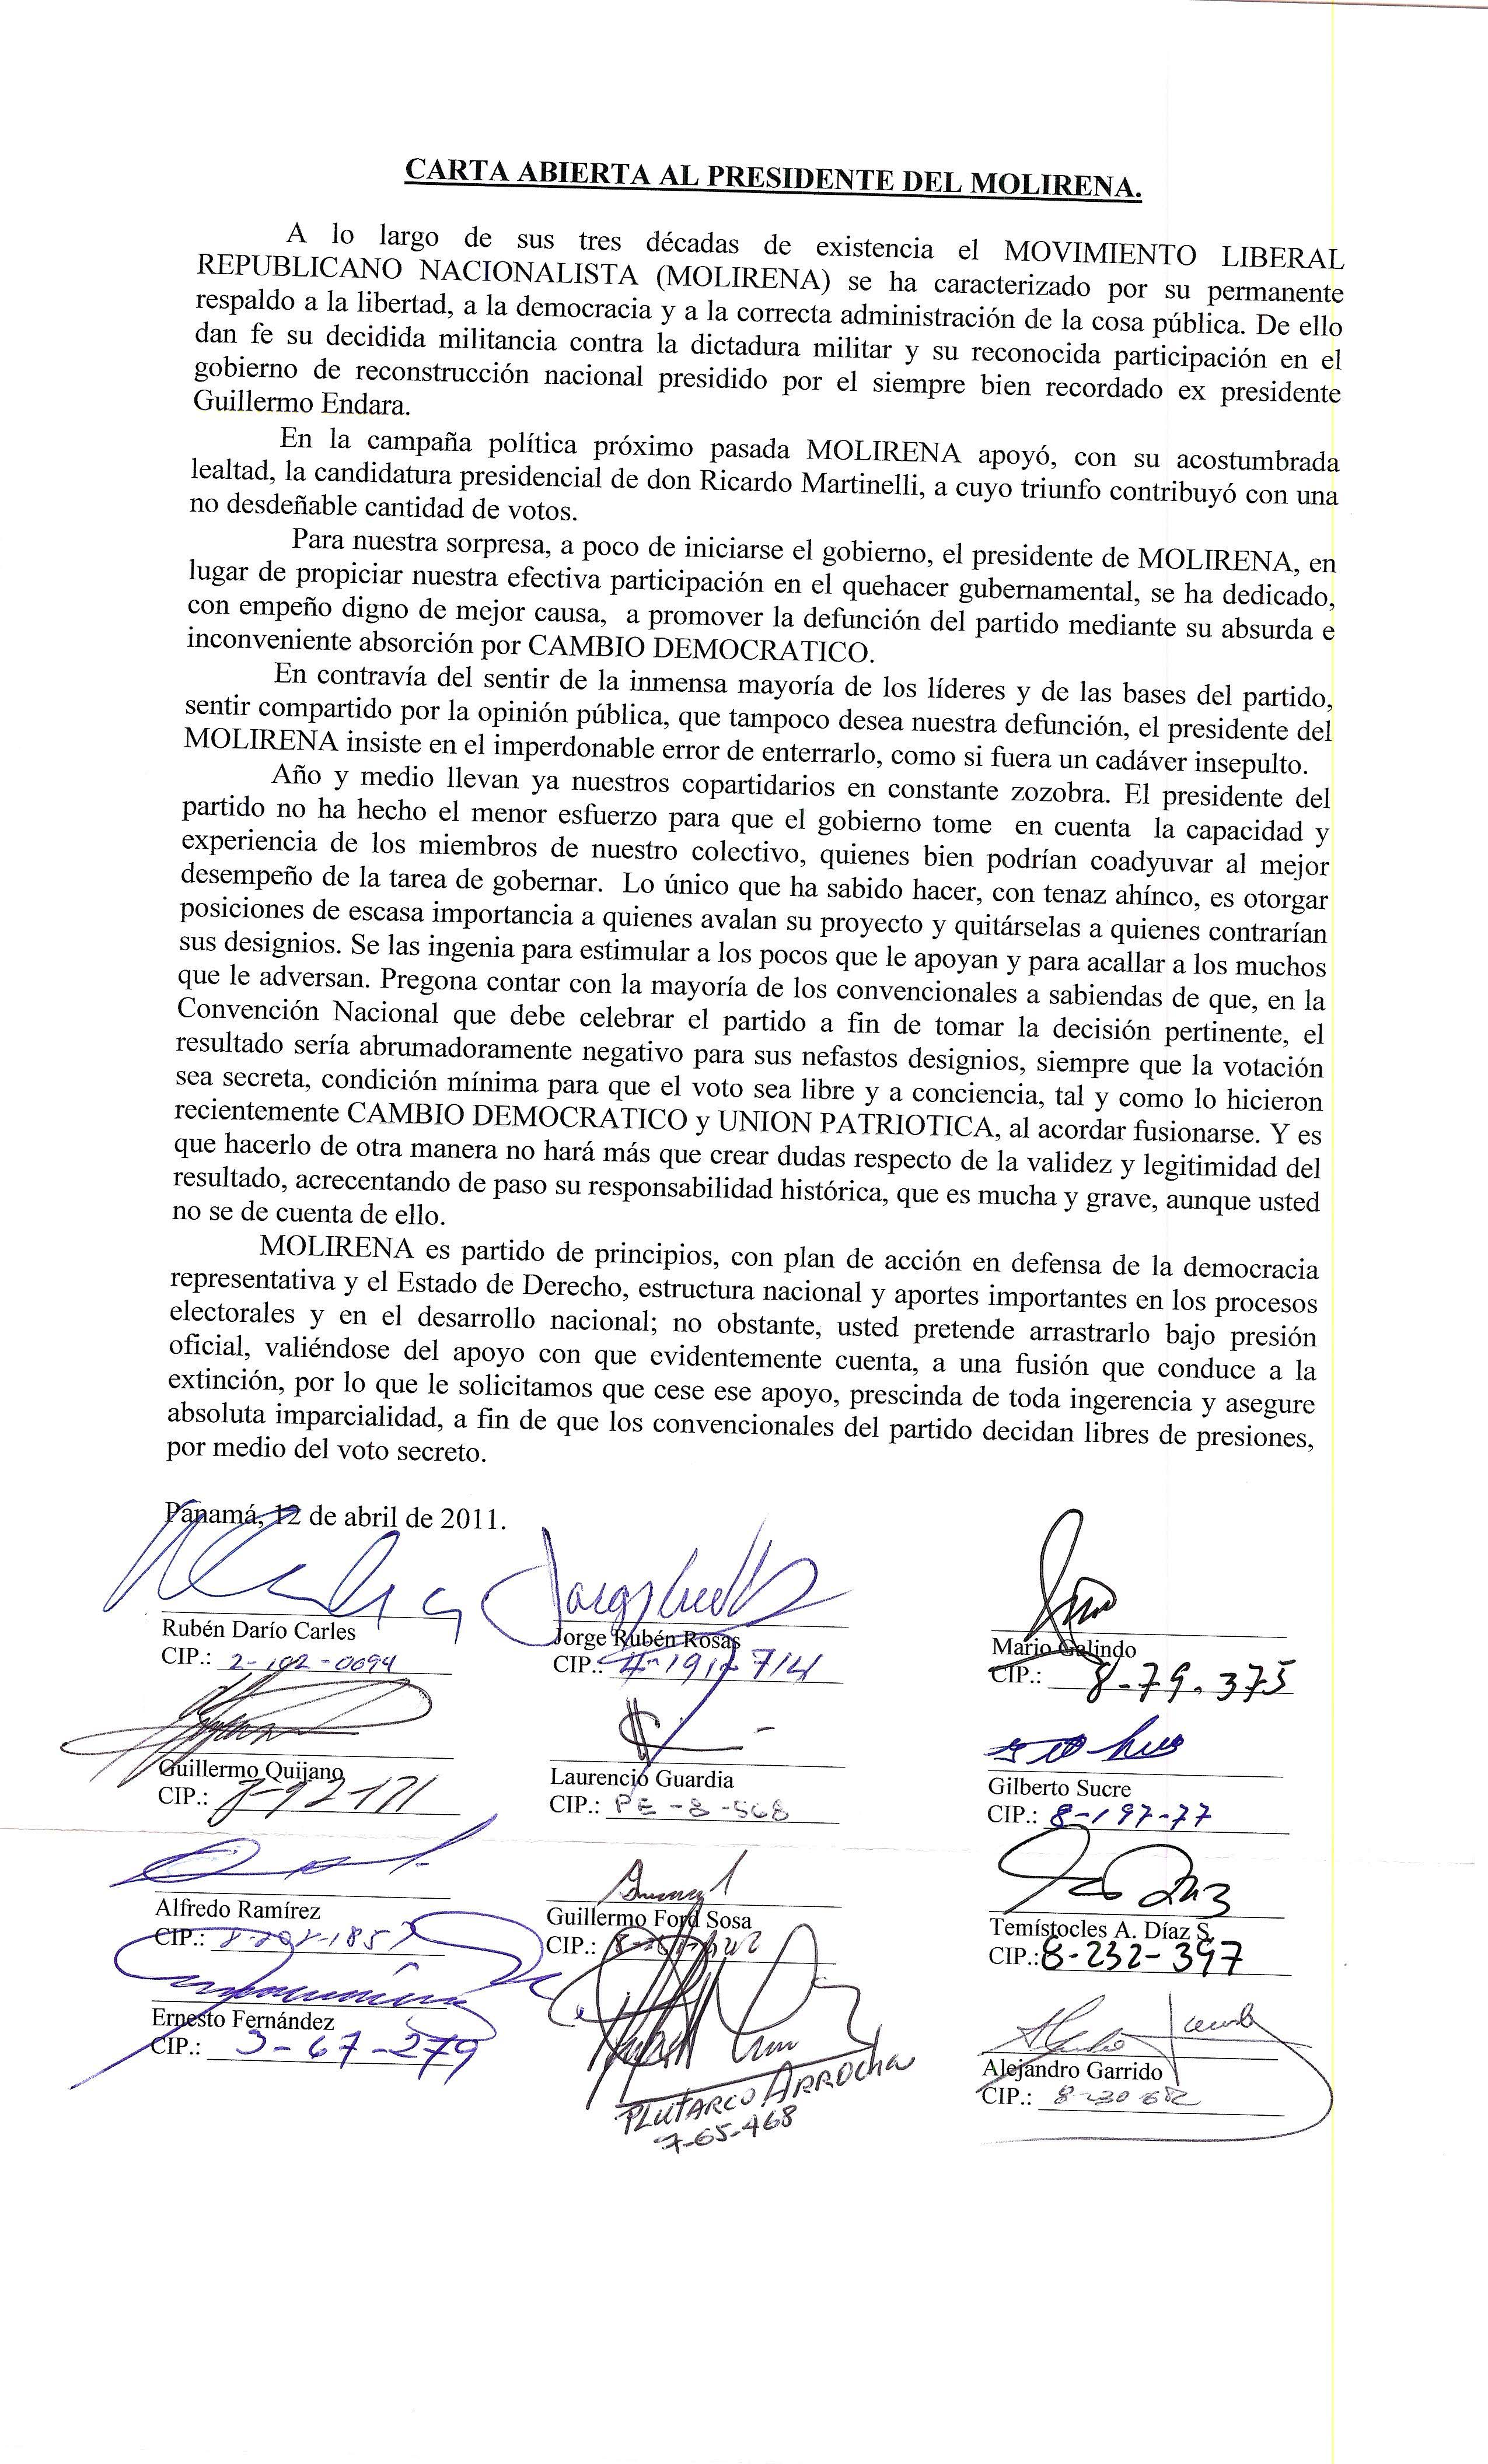 CARTA ABIERTA AL PRESIDENTE DEL MOLIRENA